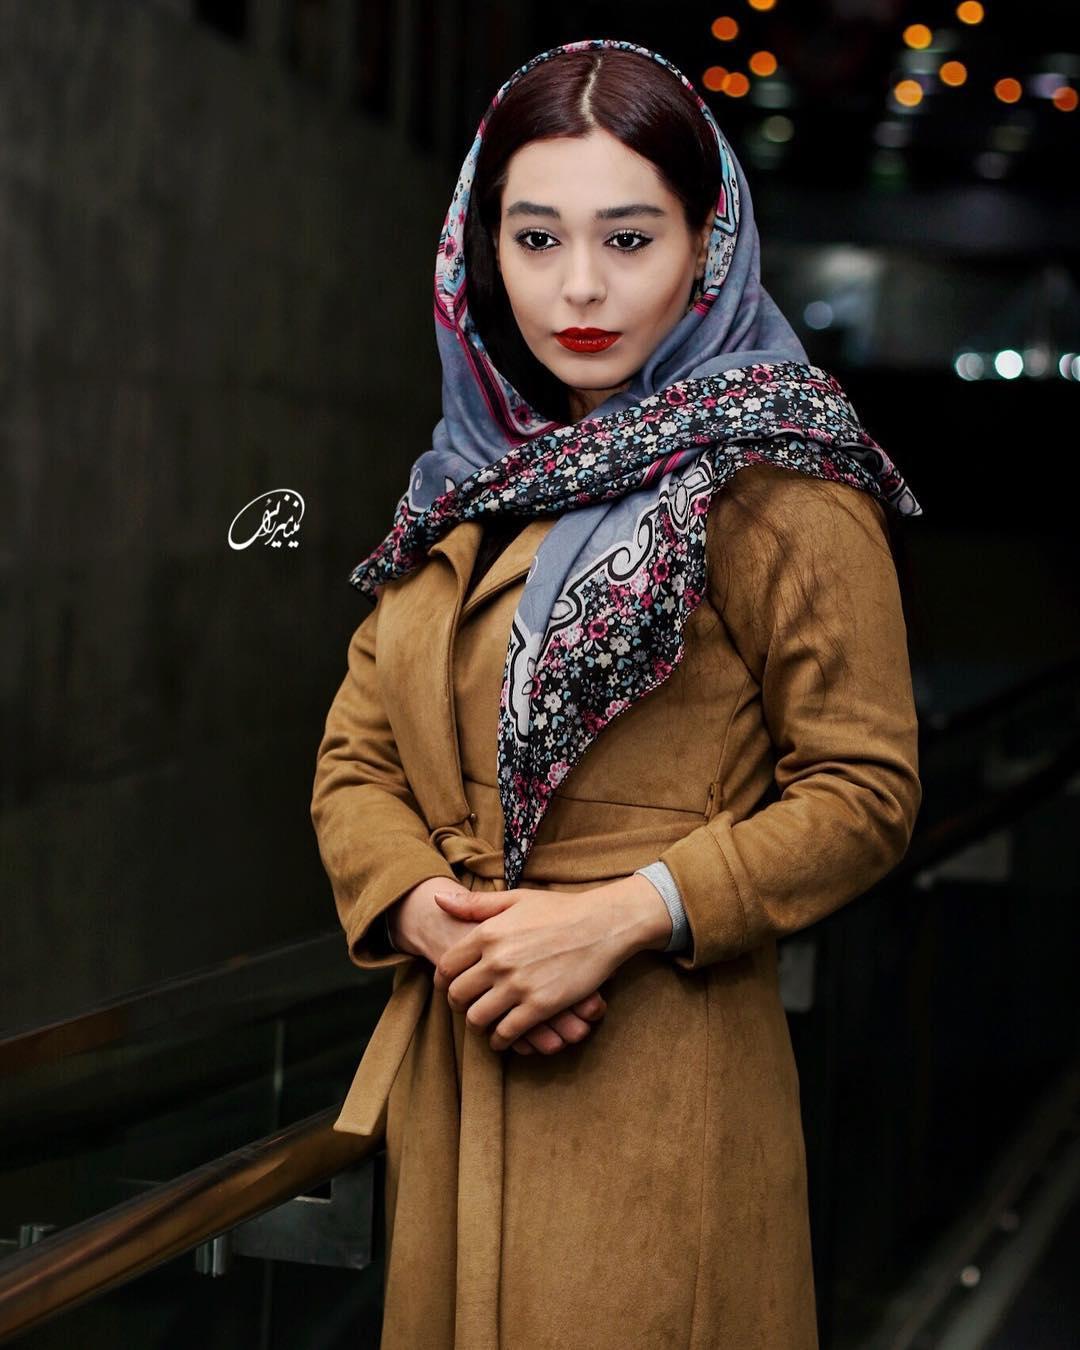 عکس سانيا سالاري در اکران فيلم بدون تاريخ بدون امضا